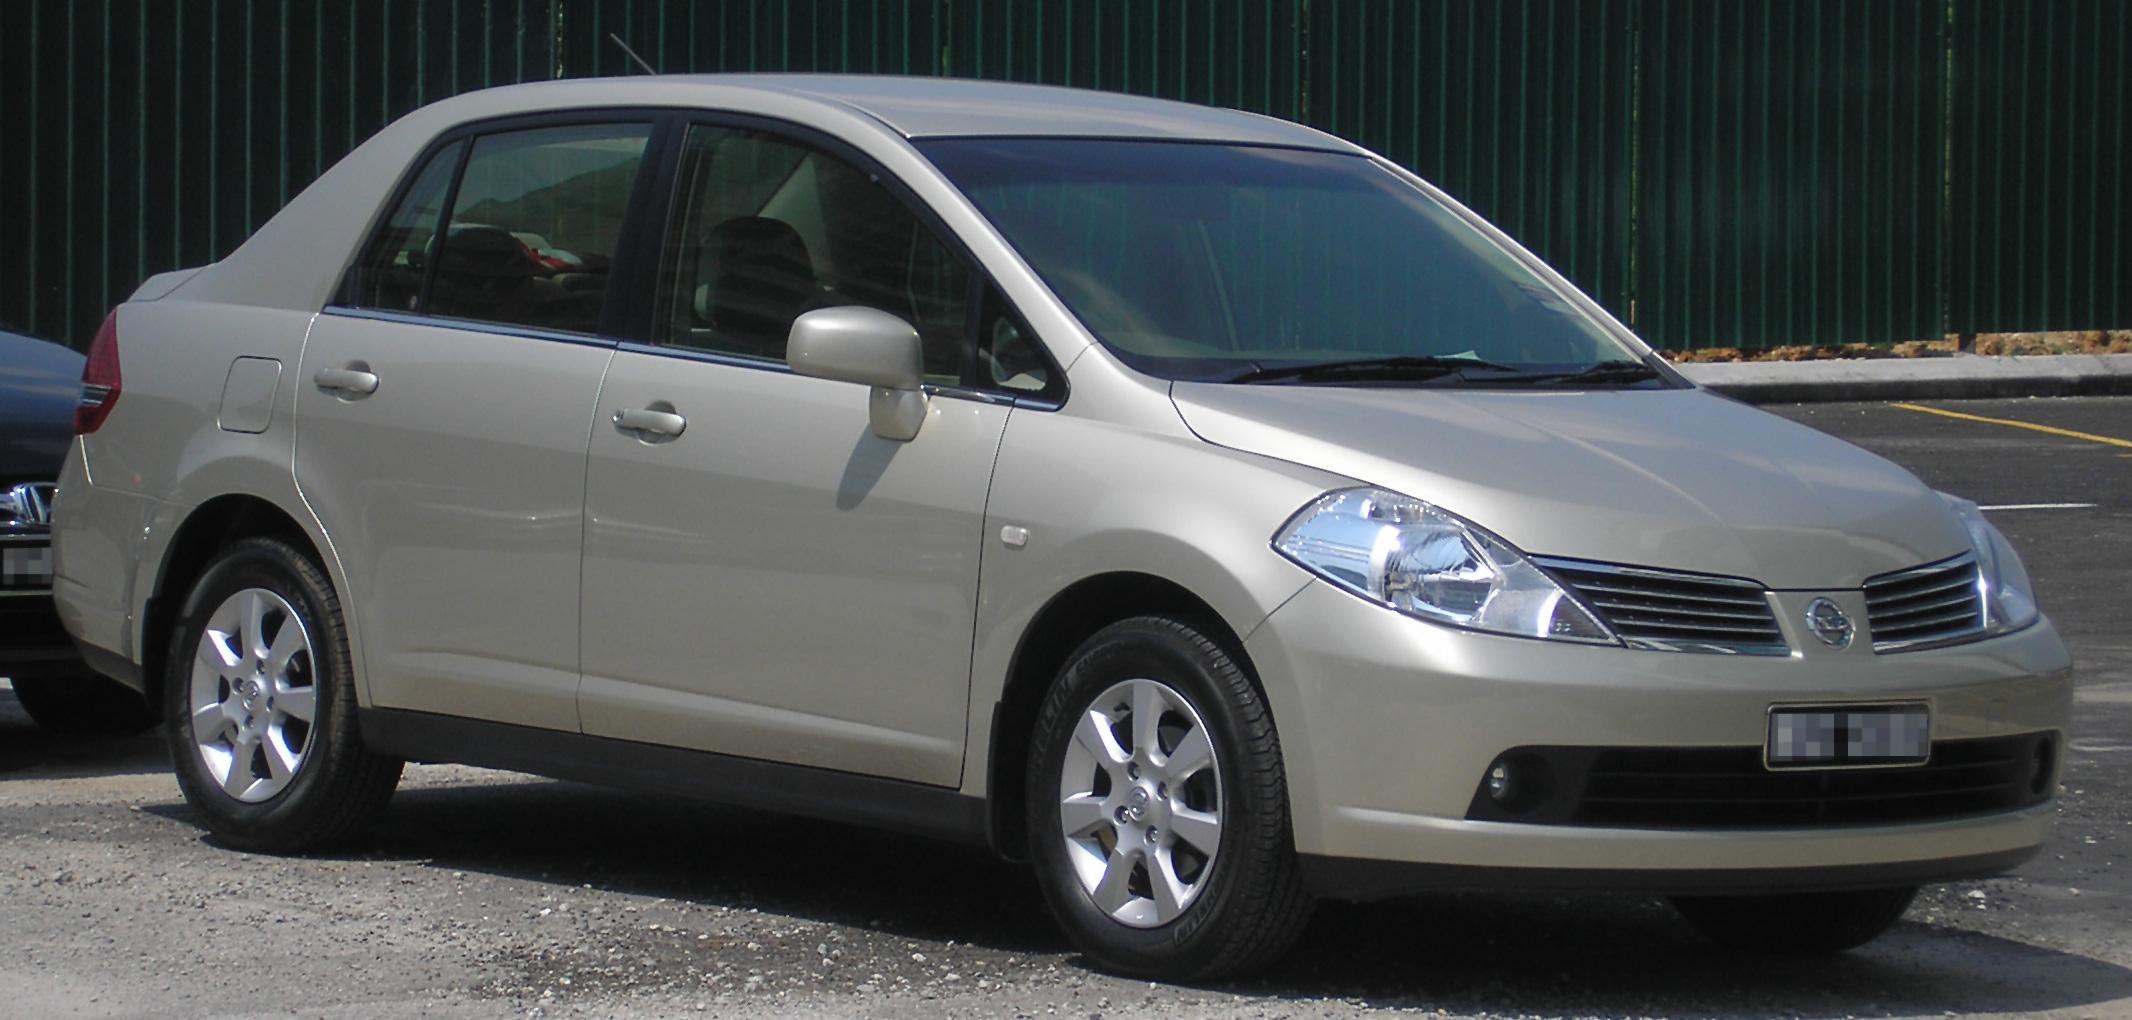 Nissan Tiida I 2004 - 2012 Sedan #2